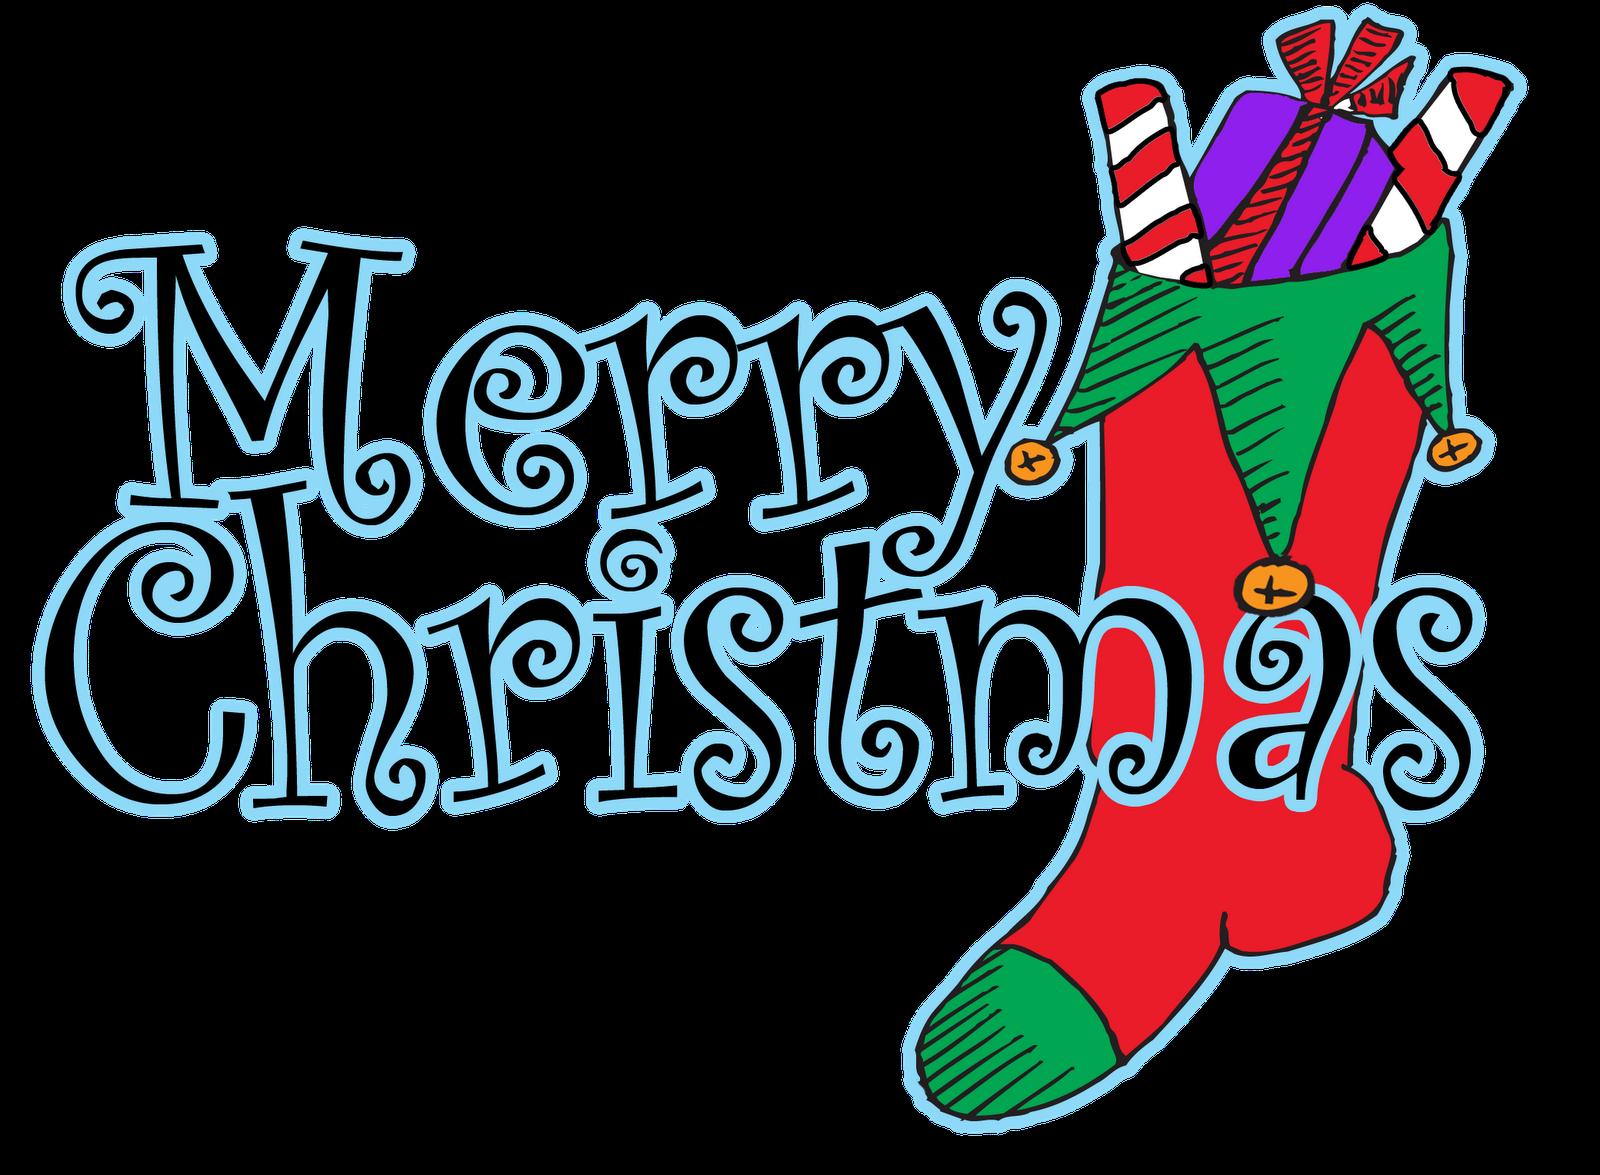 Christmas clipart word art Merry christmas christmas animated Merry